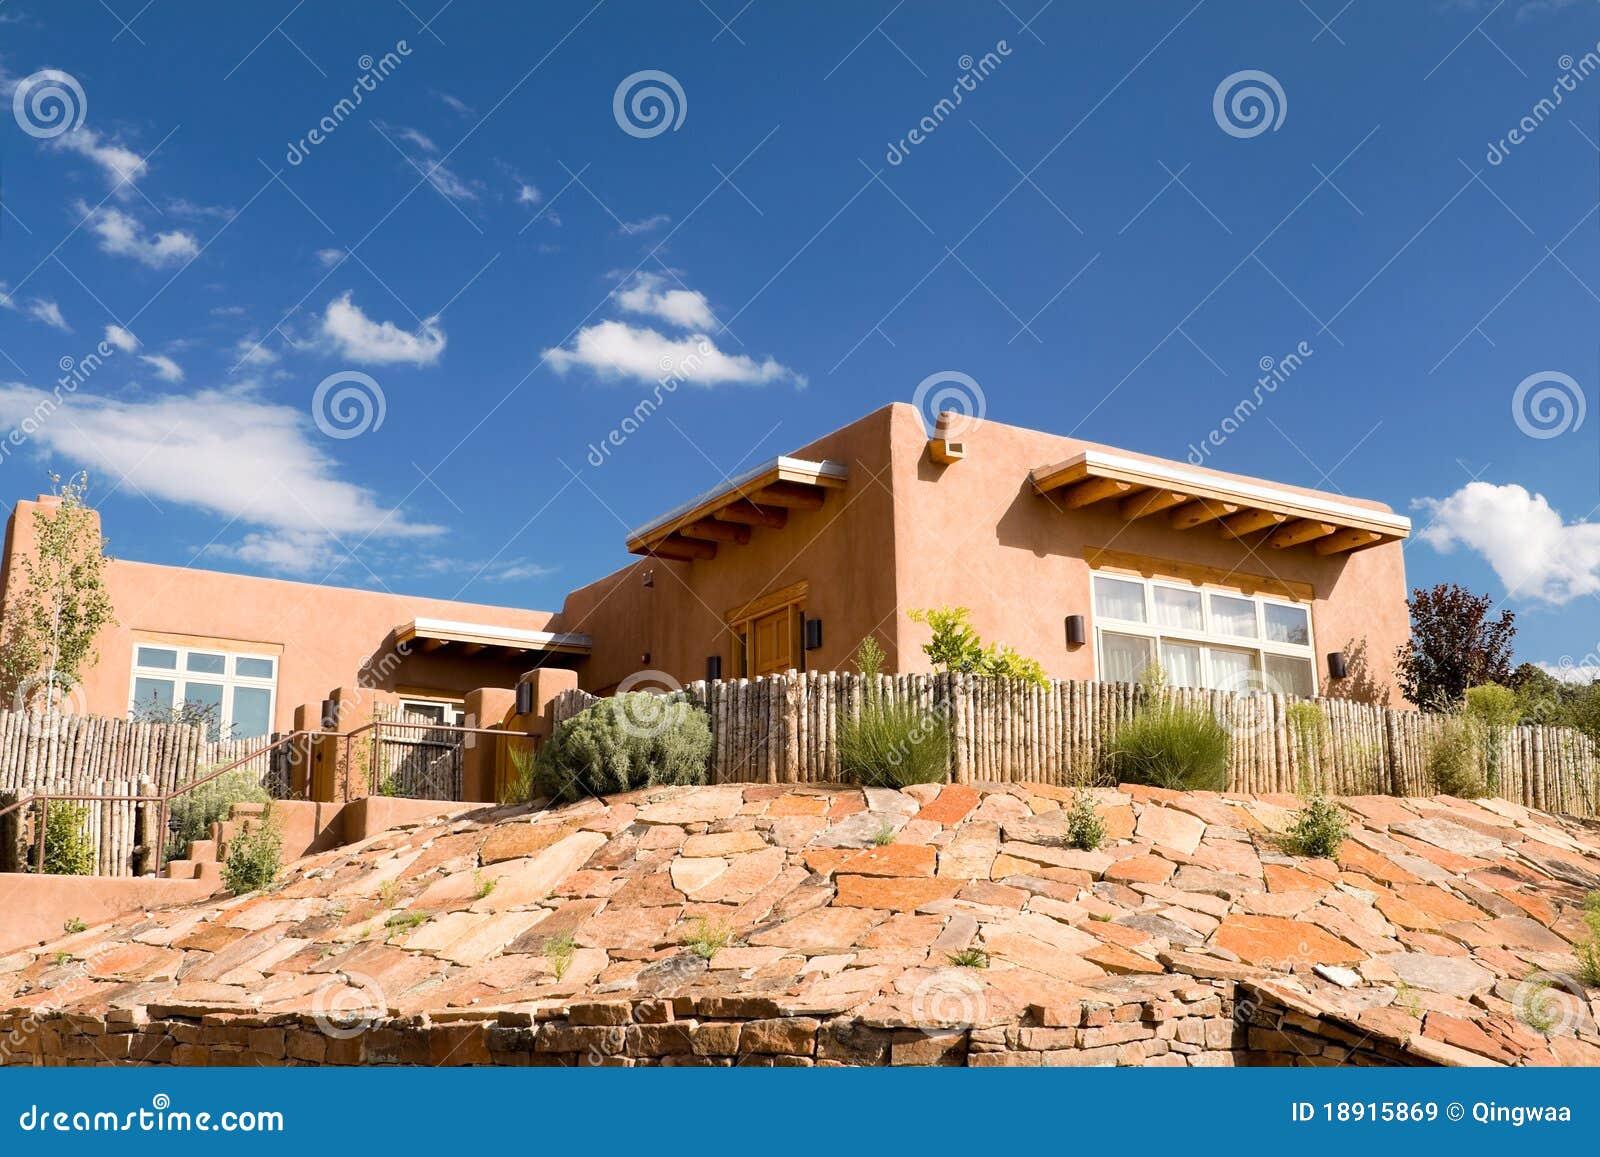 Mission adobe home palisade fence santa fe nm usa stock for Santa fe adobe homes